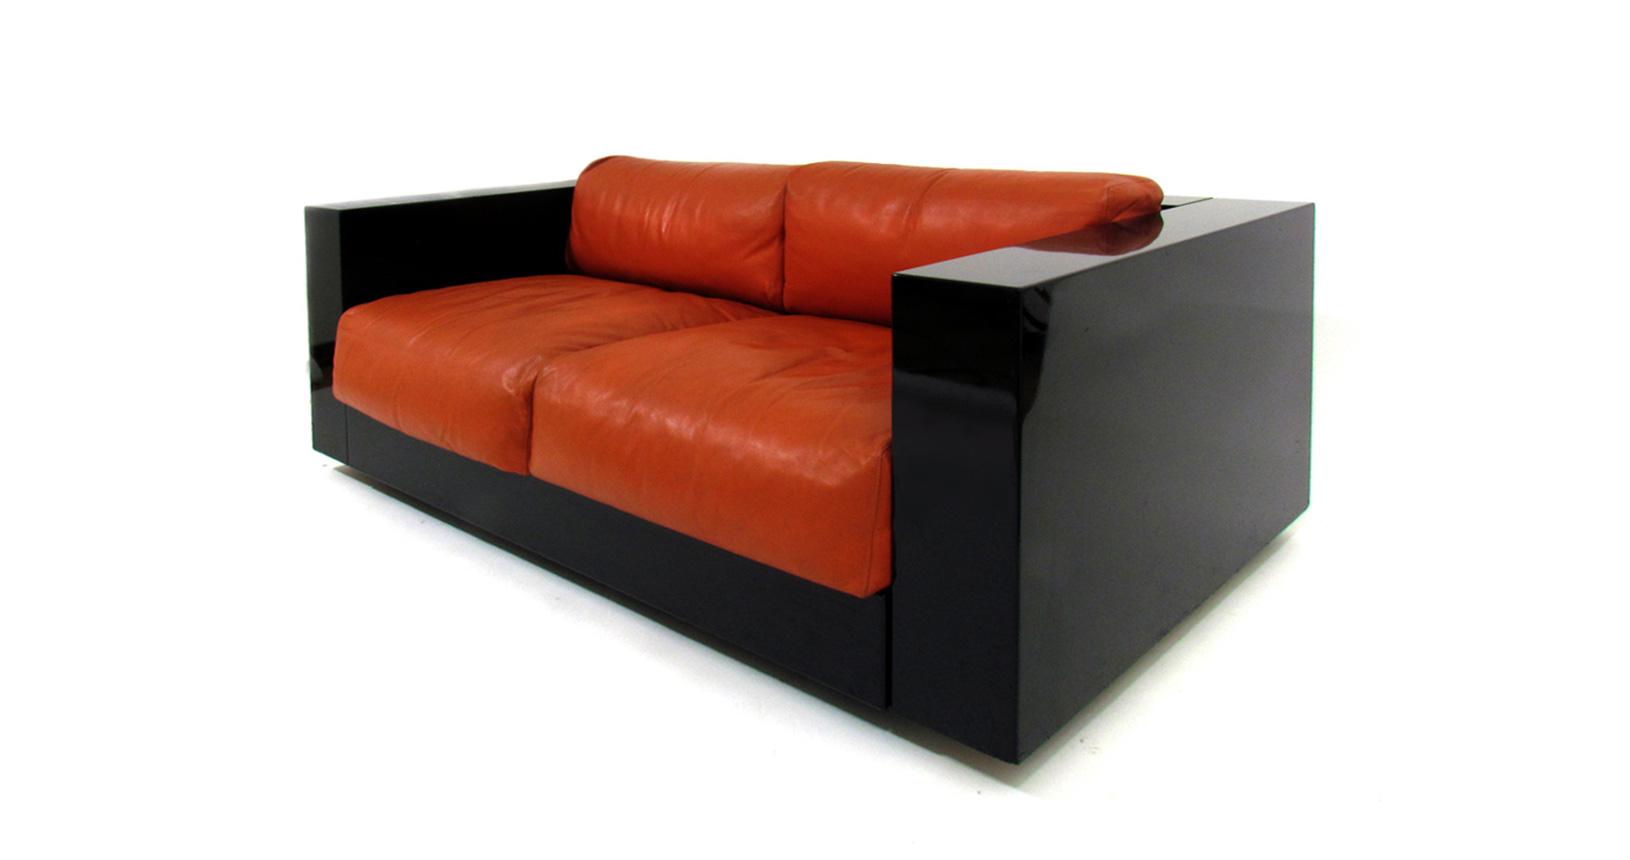 Saratoga Poltronova Vignelli associates Leather sofa divano pelle